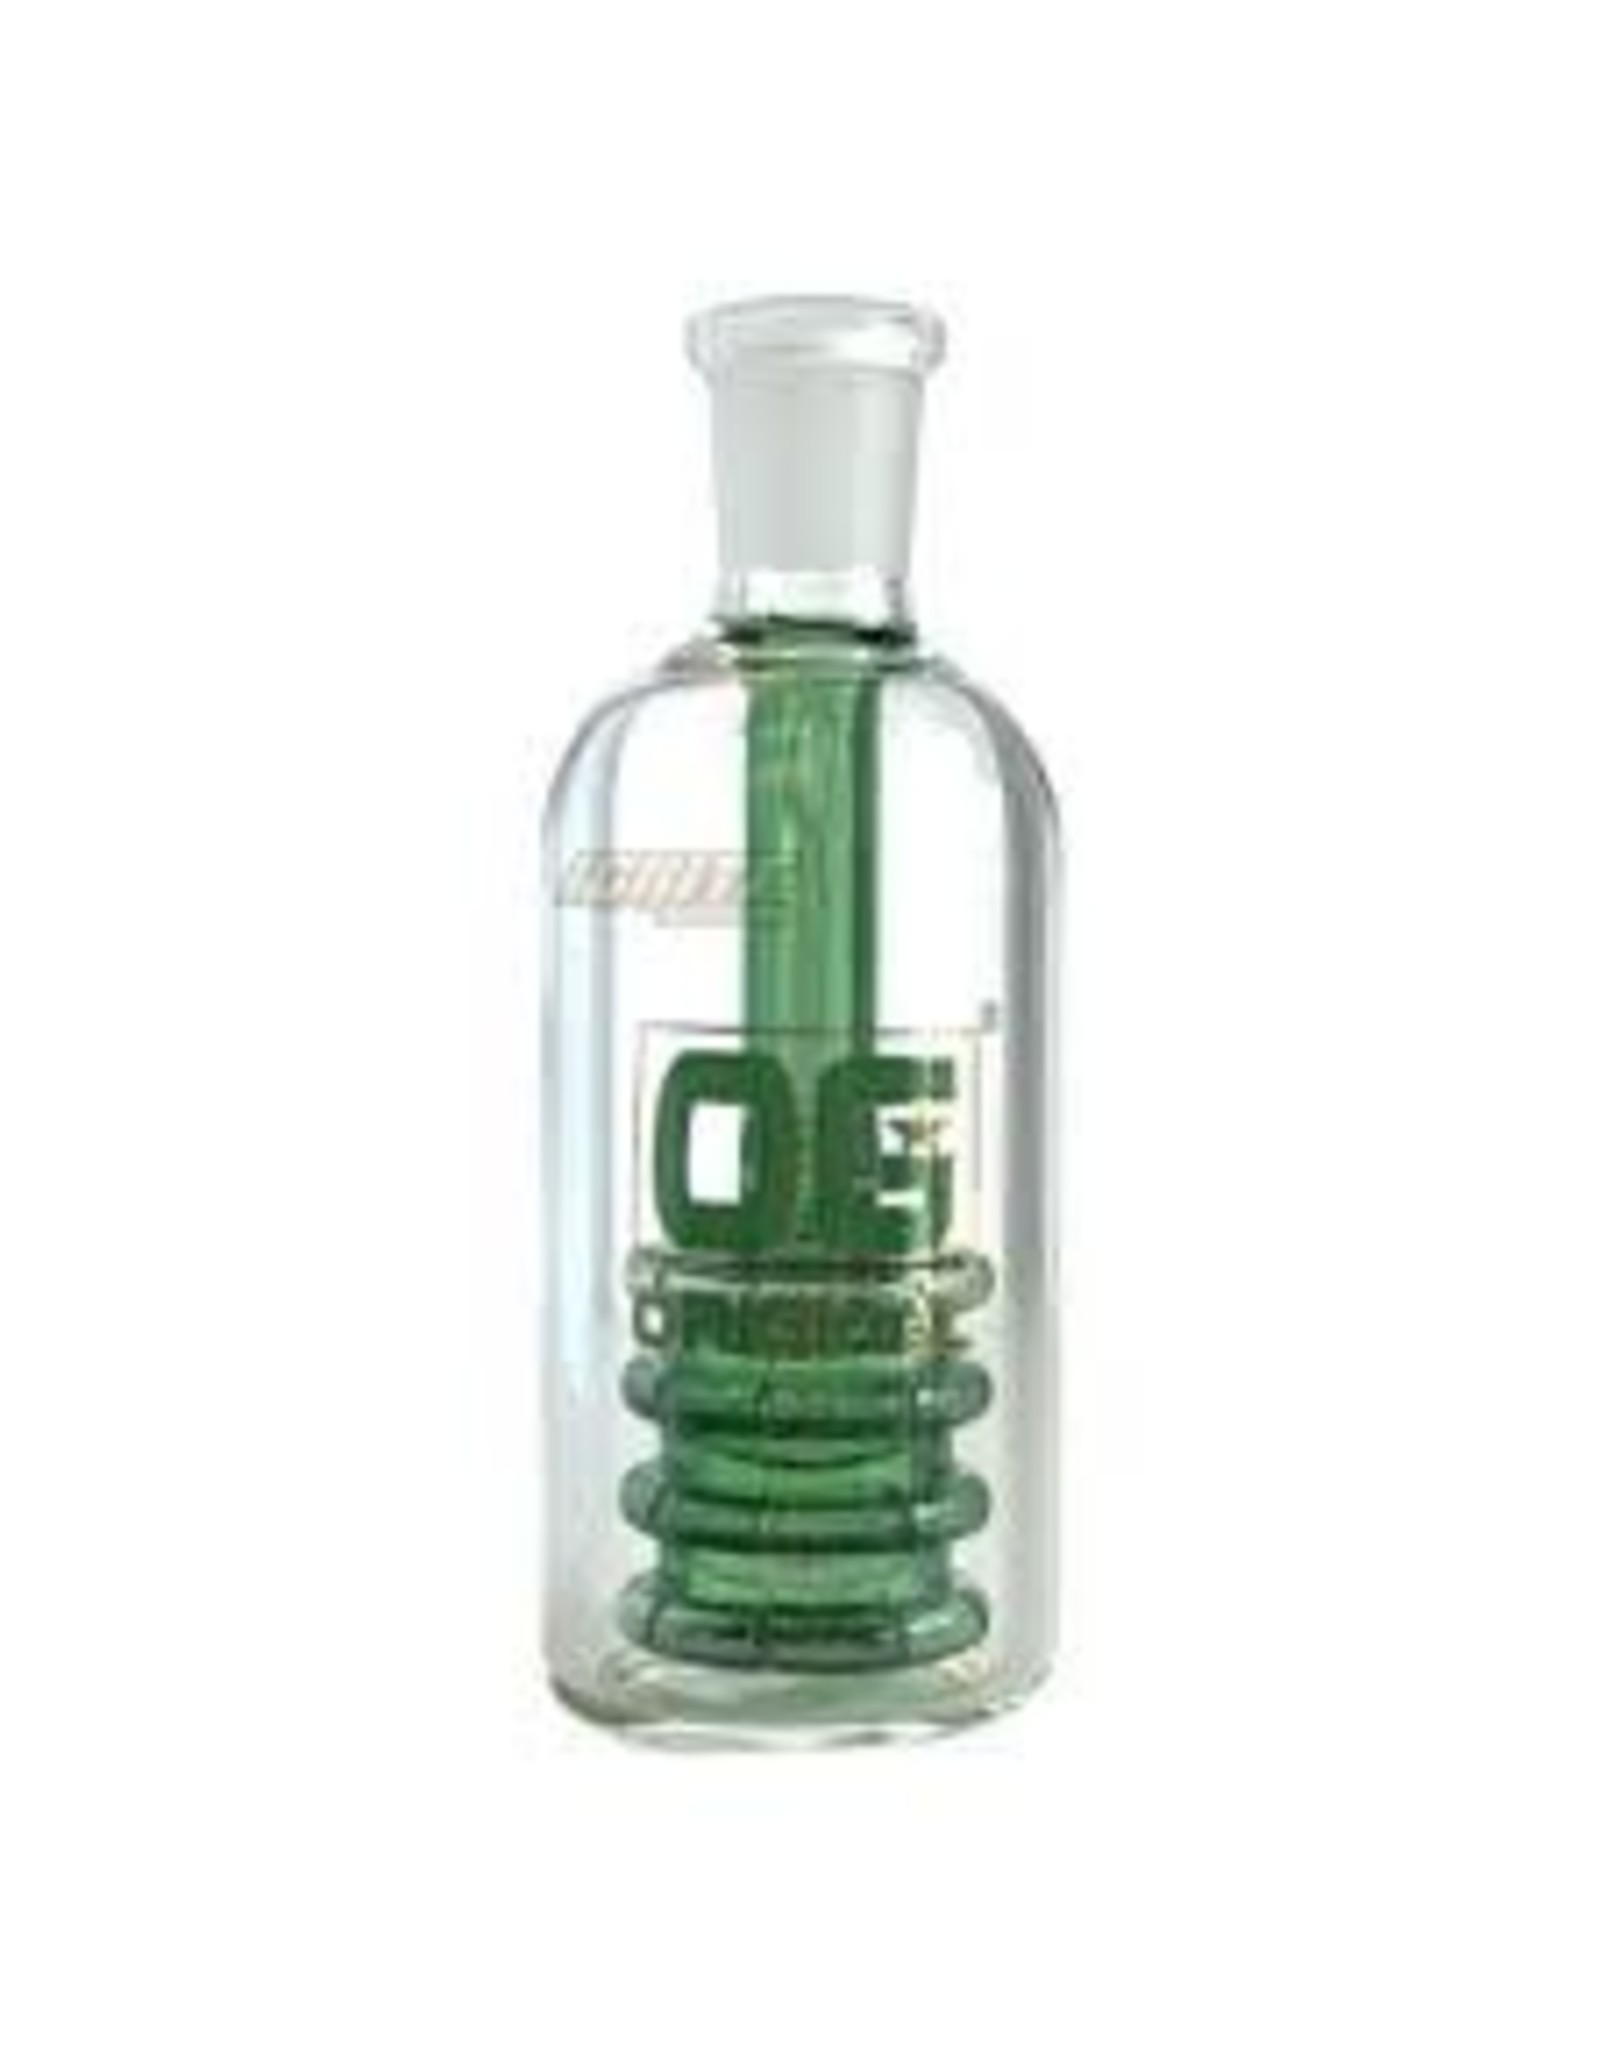 ORIGINAL GLASS ASH CATCHER OG-ASH006 SHOWER HEAD